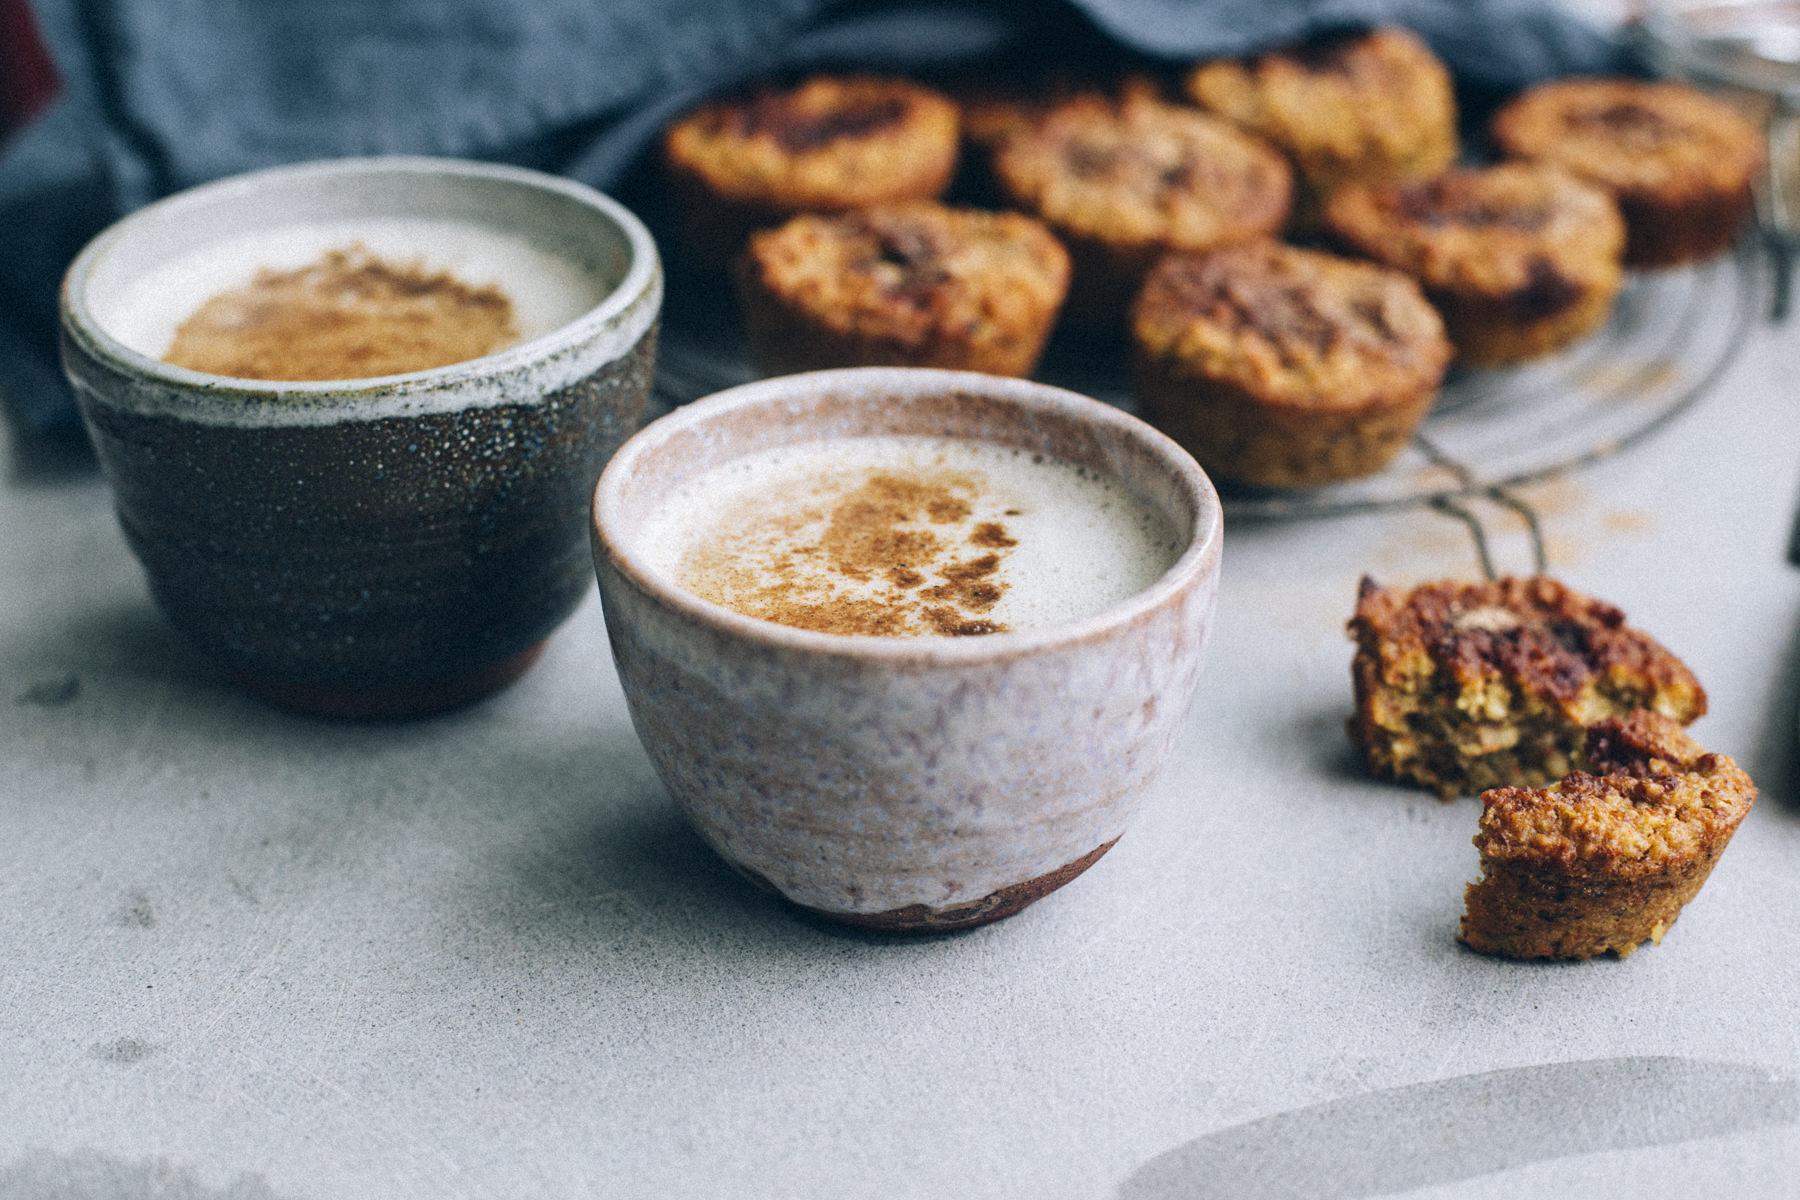 16oct31-carrot_muffins-09